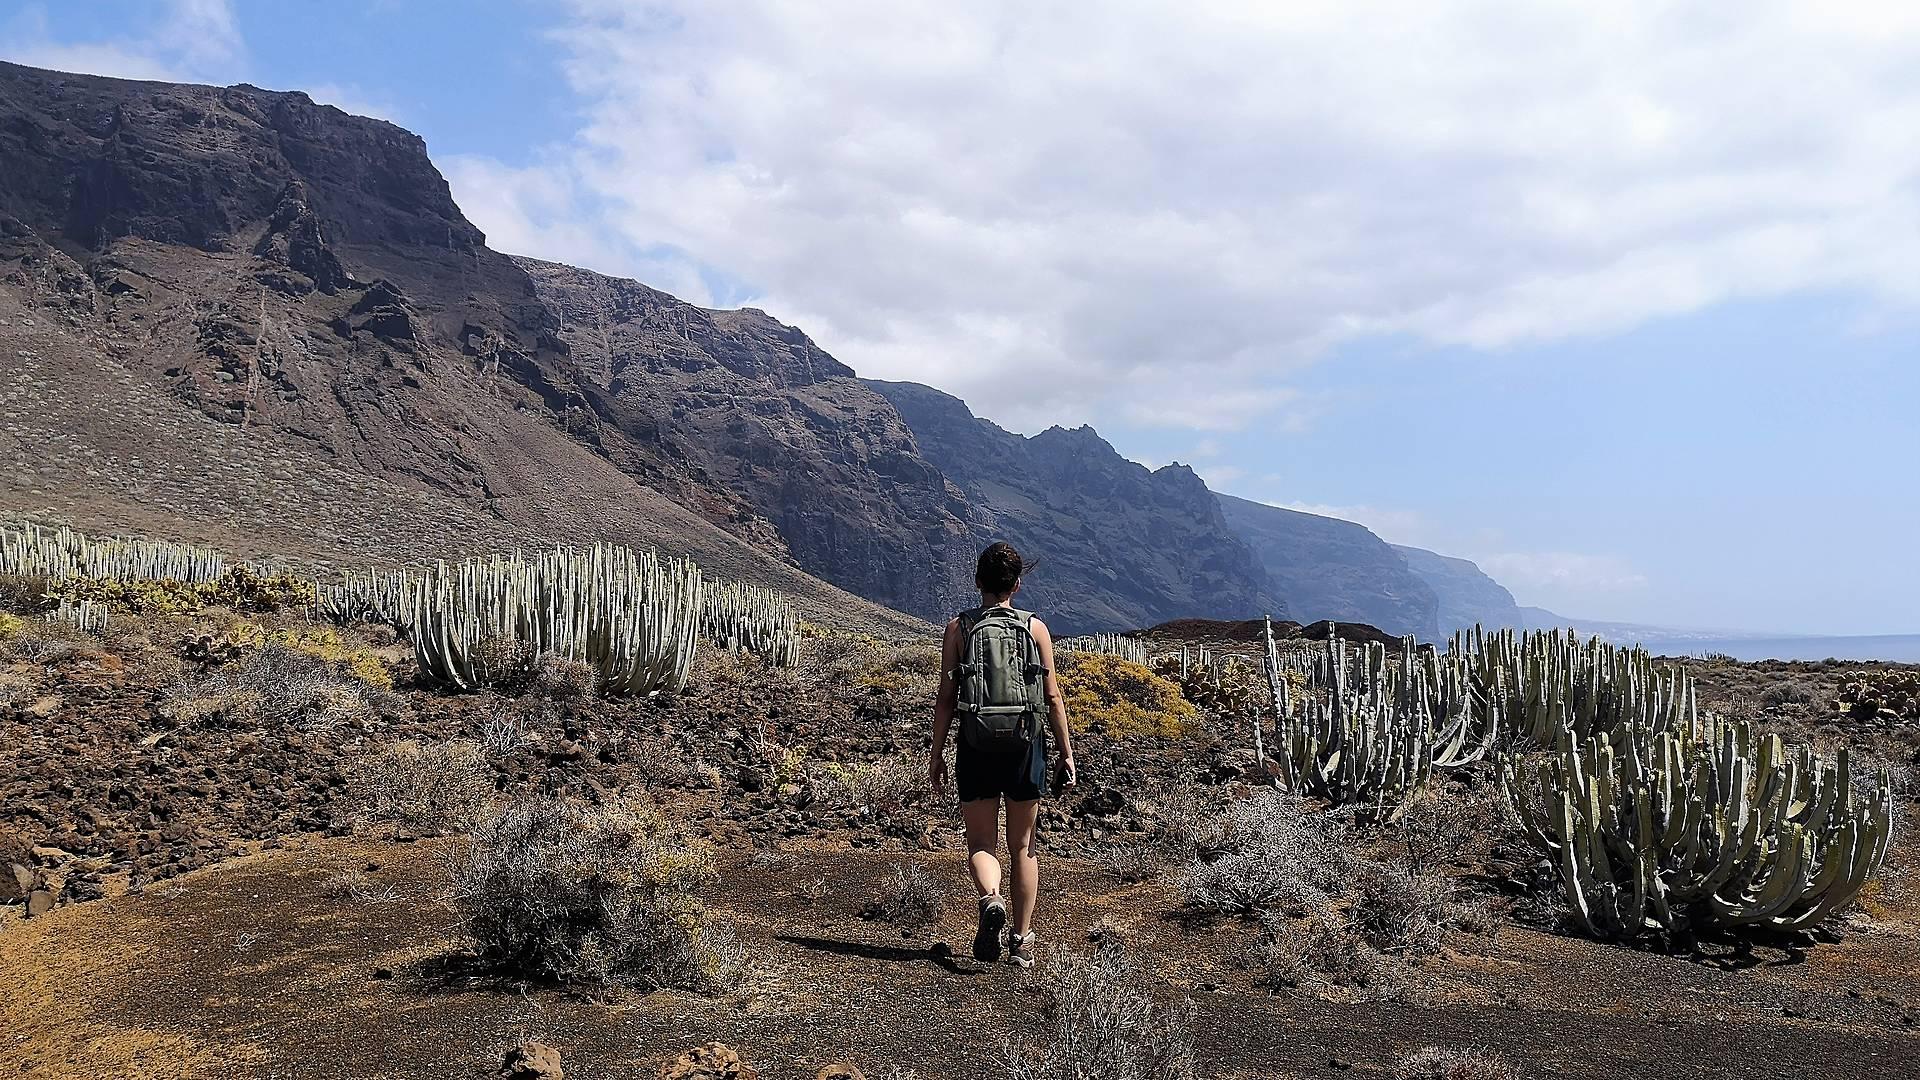 Tenerife, La Gomera, La Palma, trio magnifique